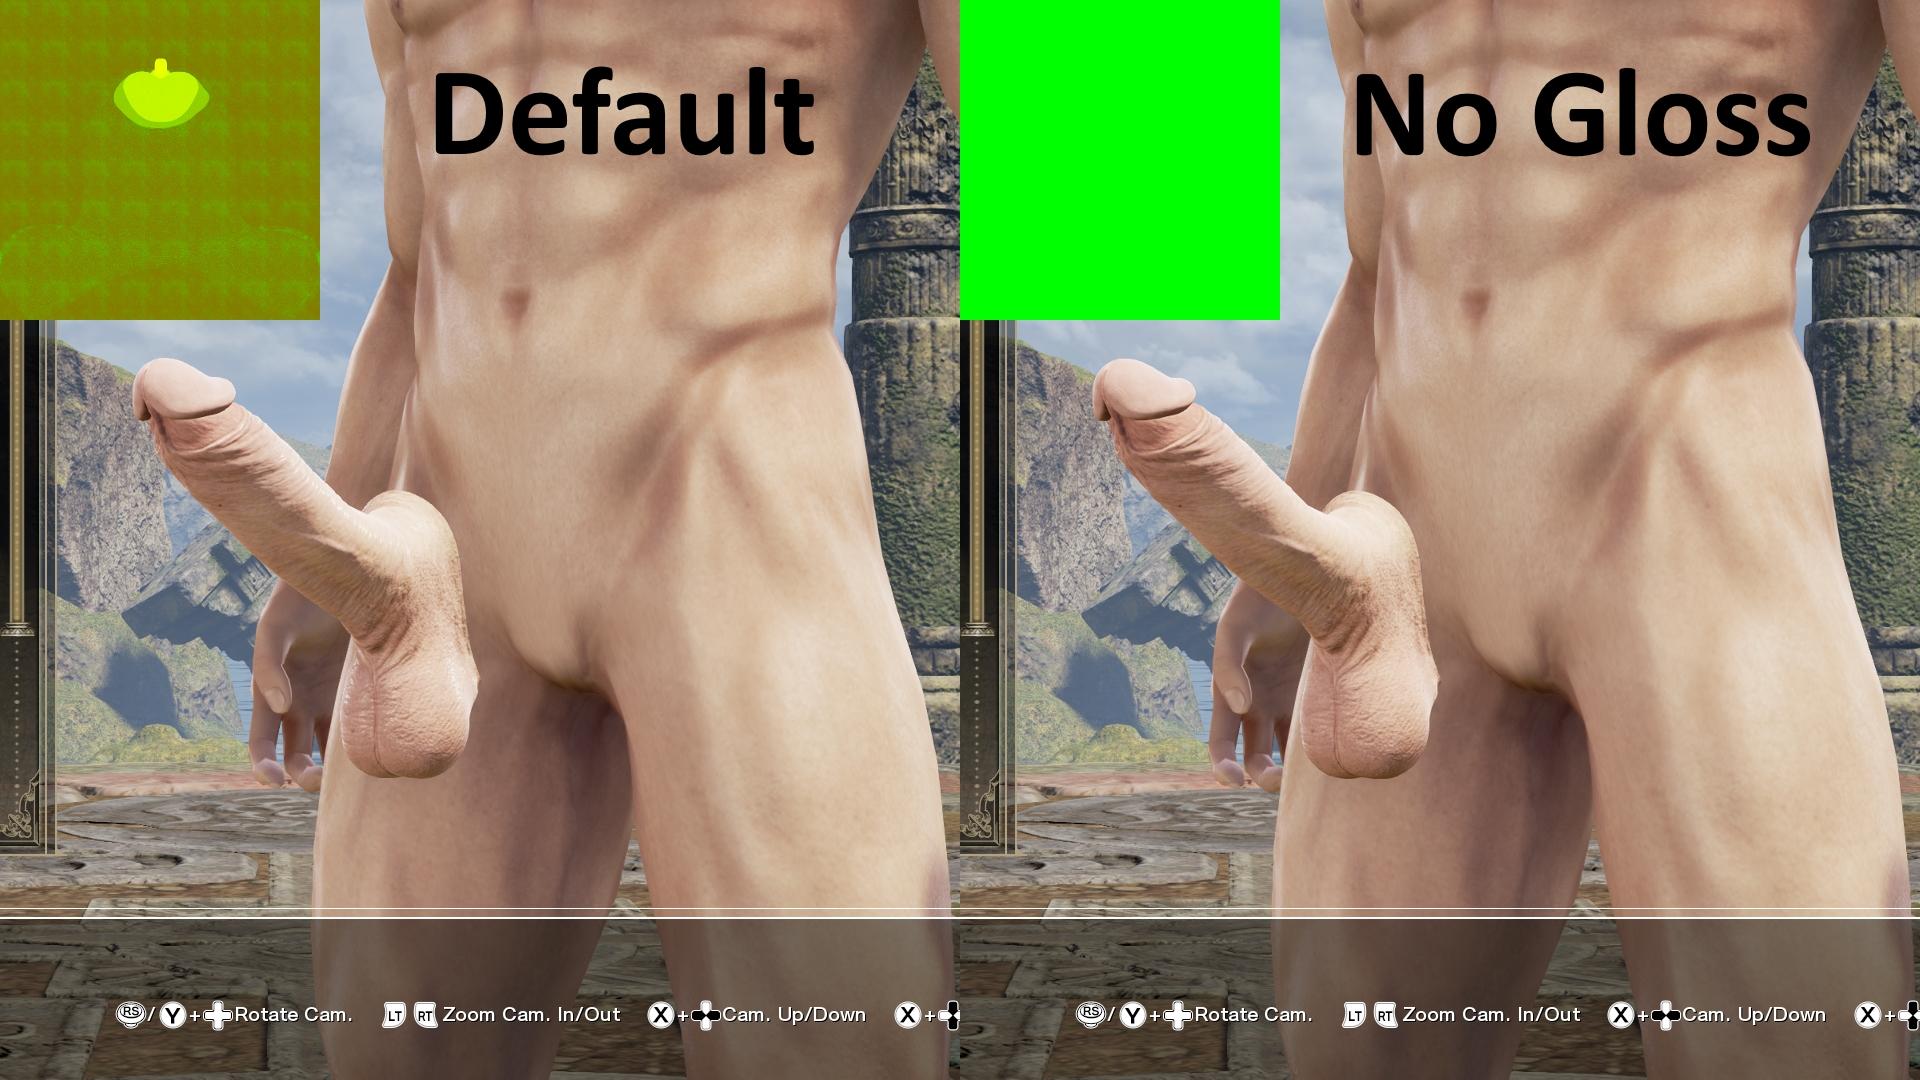 defaultvsglossless.jpg